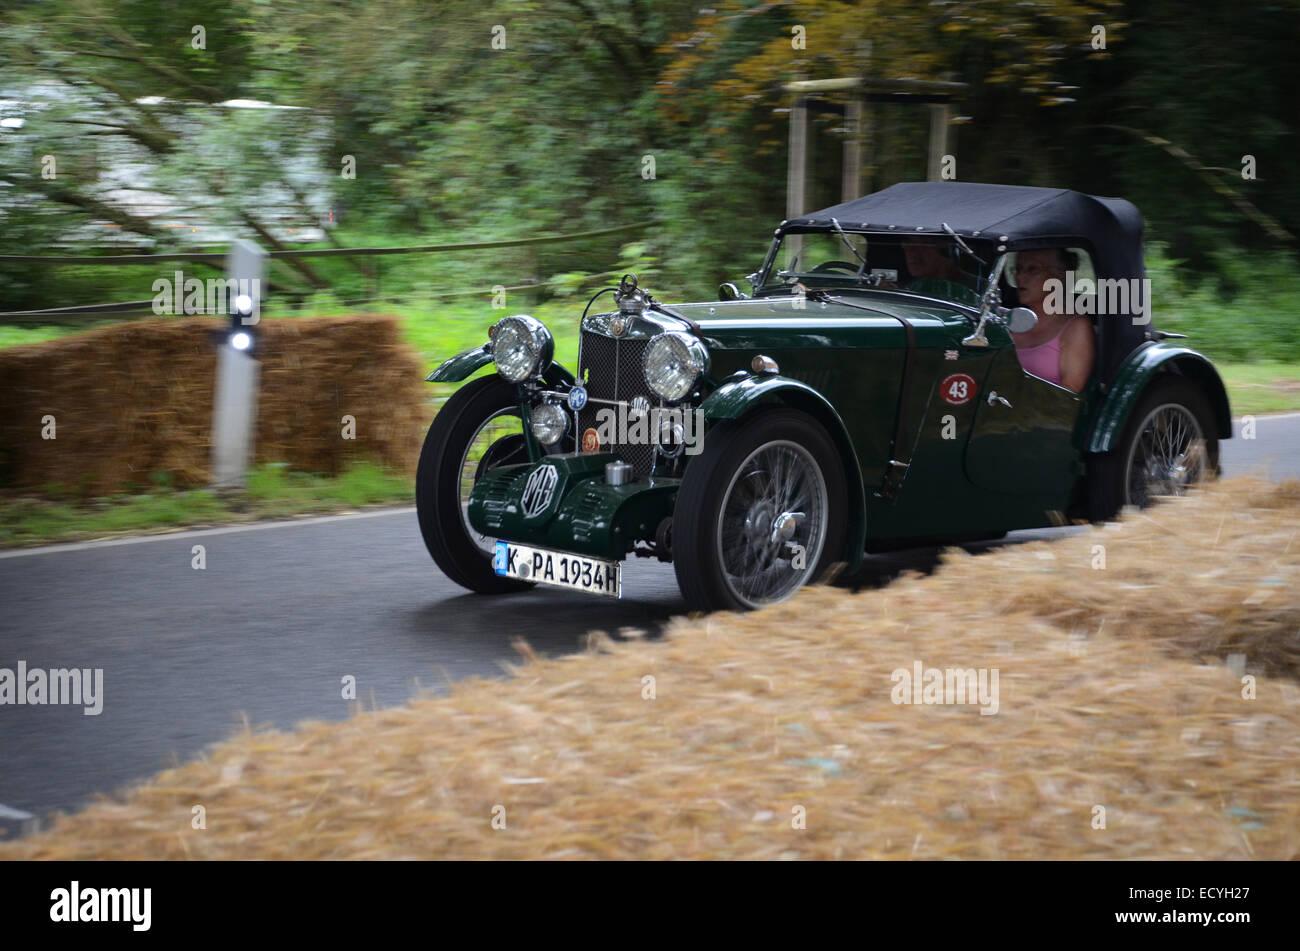 supercharged 1930s MG PA at Classic Days 2014 at Dyck Castle near Düsseldorf, North Rhine Westphalia, Germany, - Stock Image